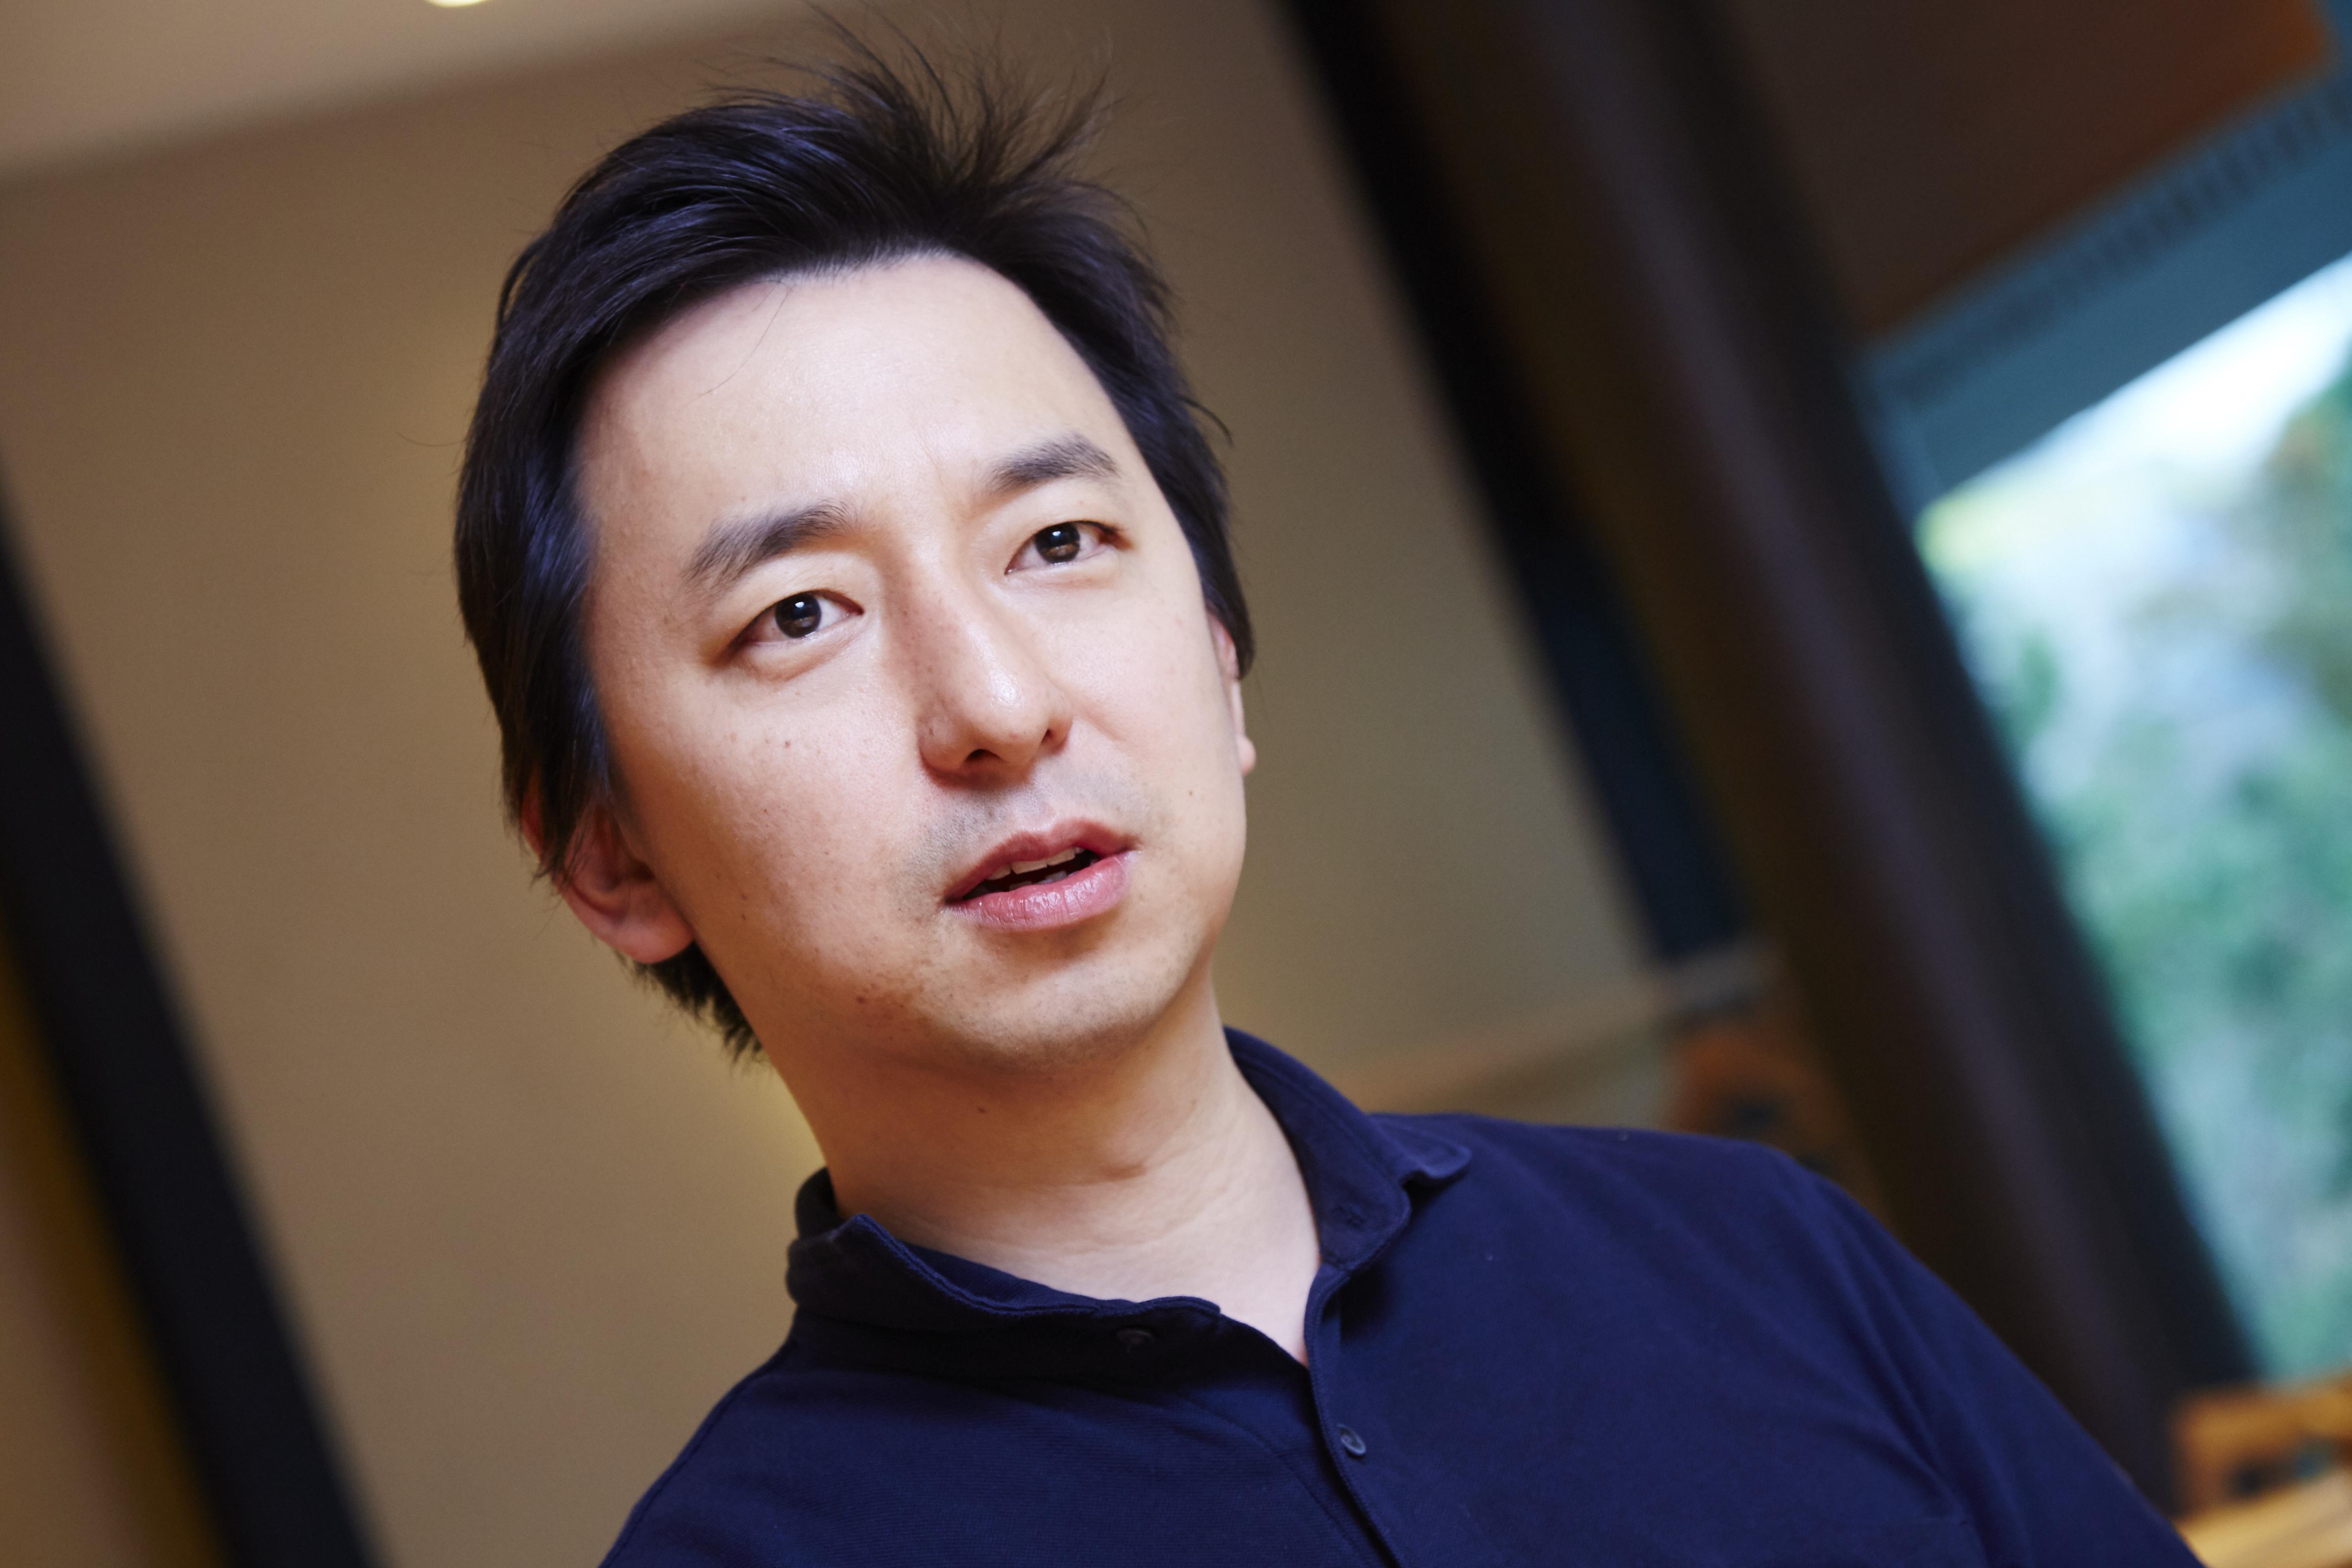 Hoba Masahiko Arai